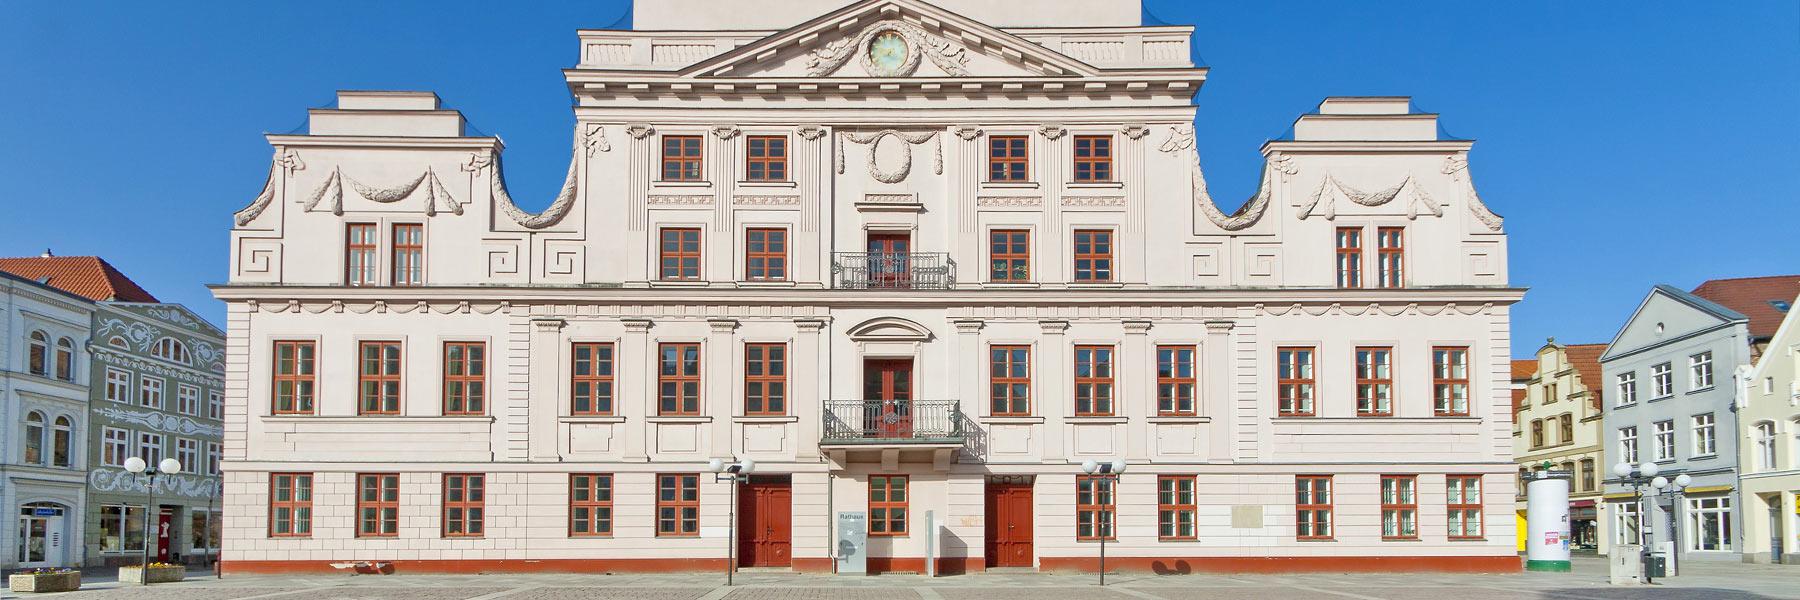 Rathaus - Güstrow